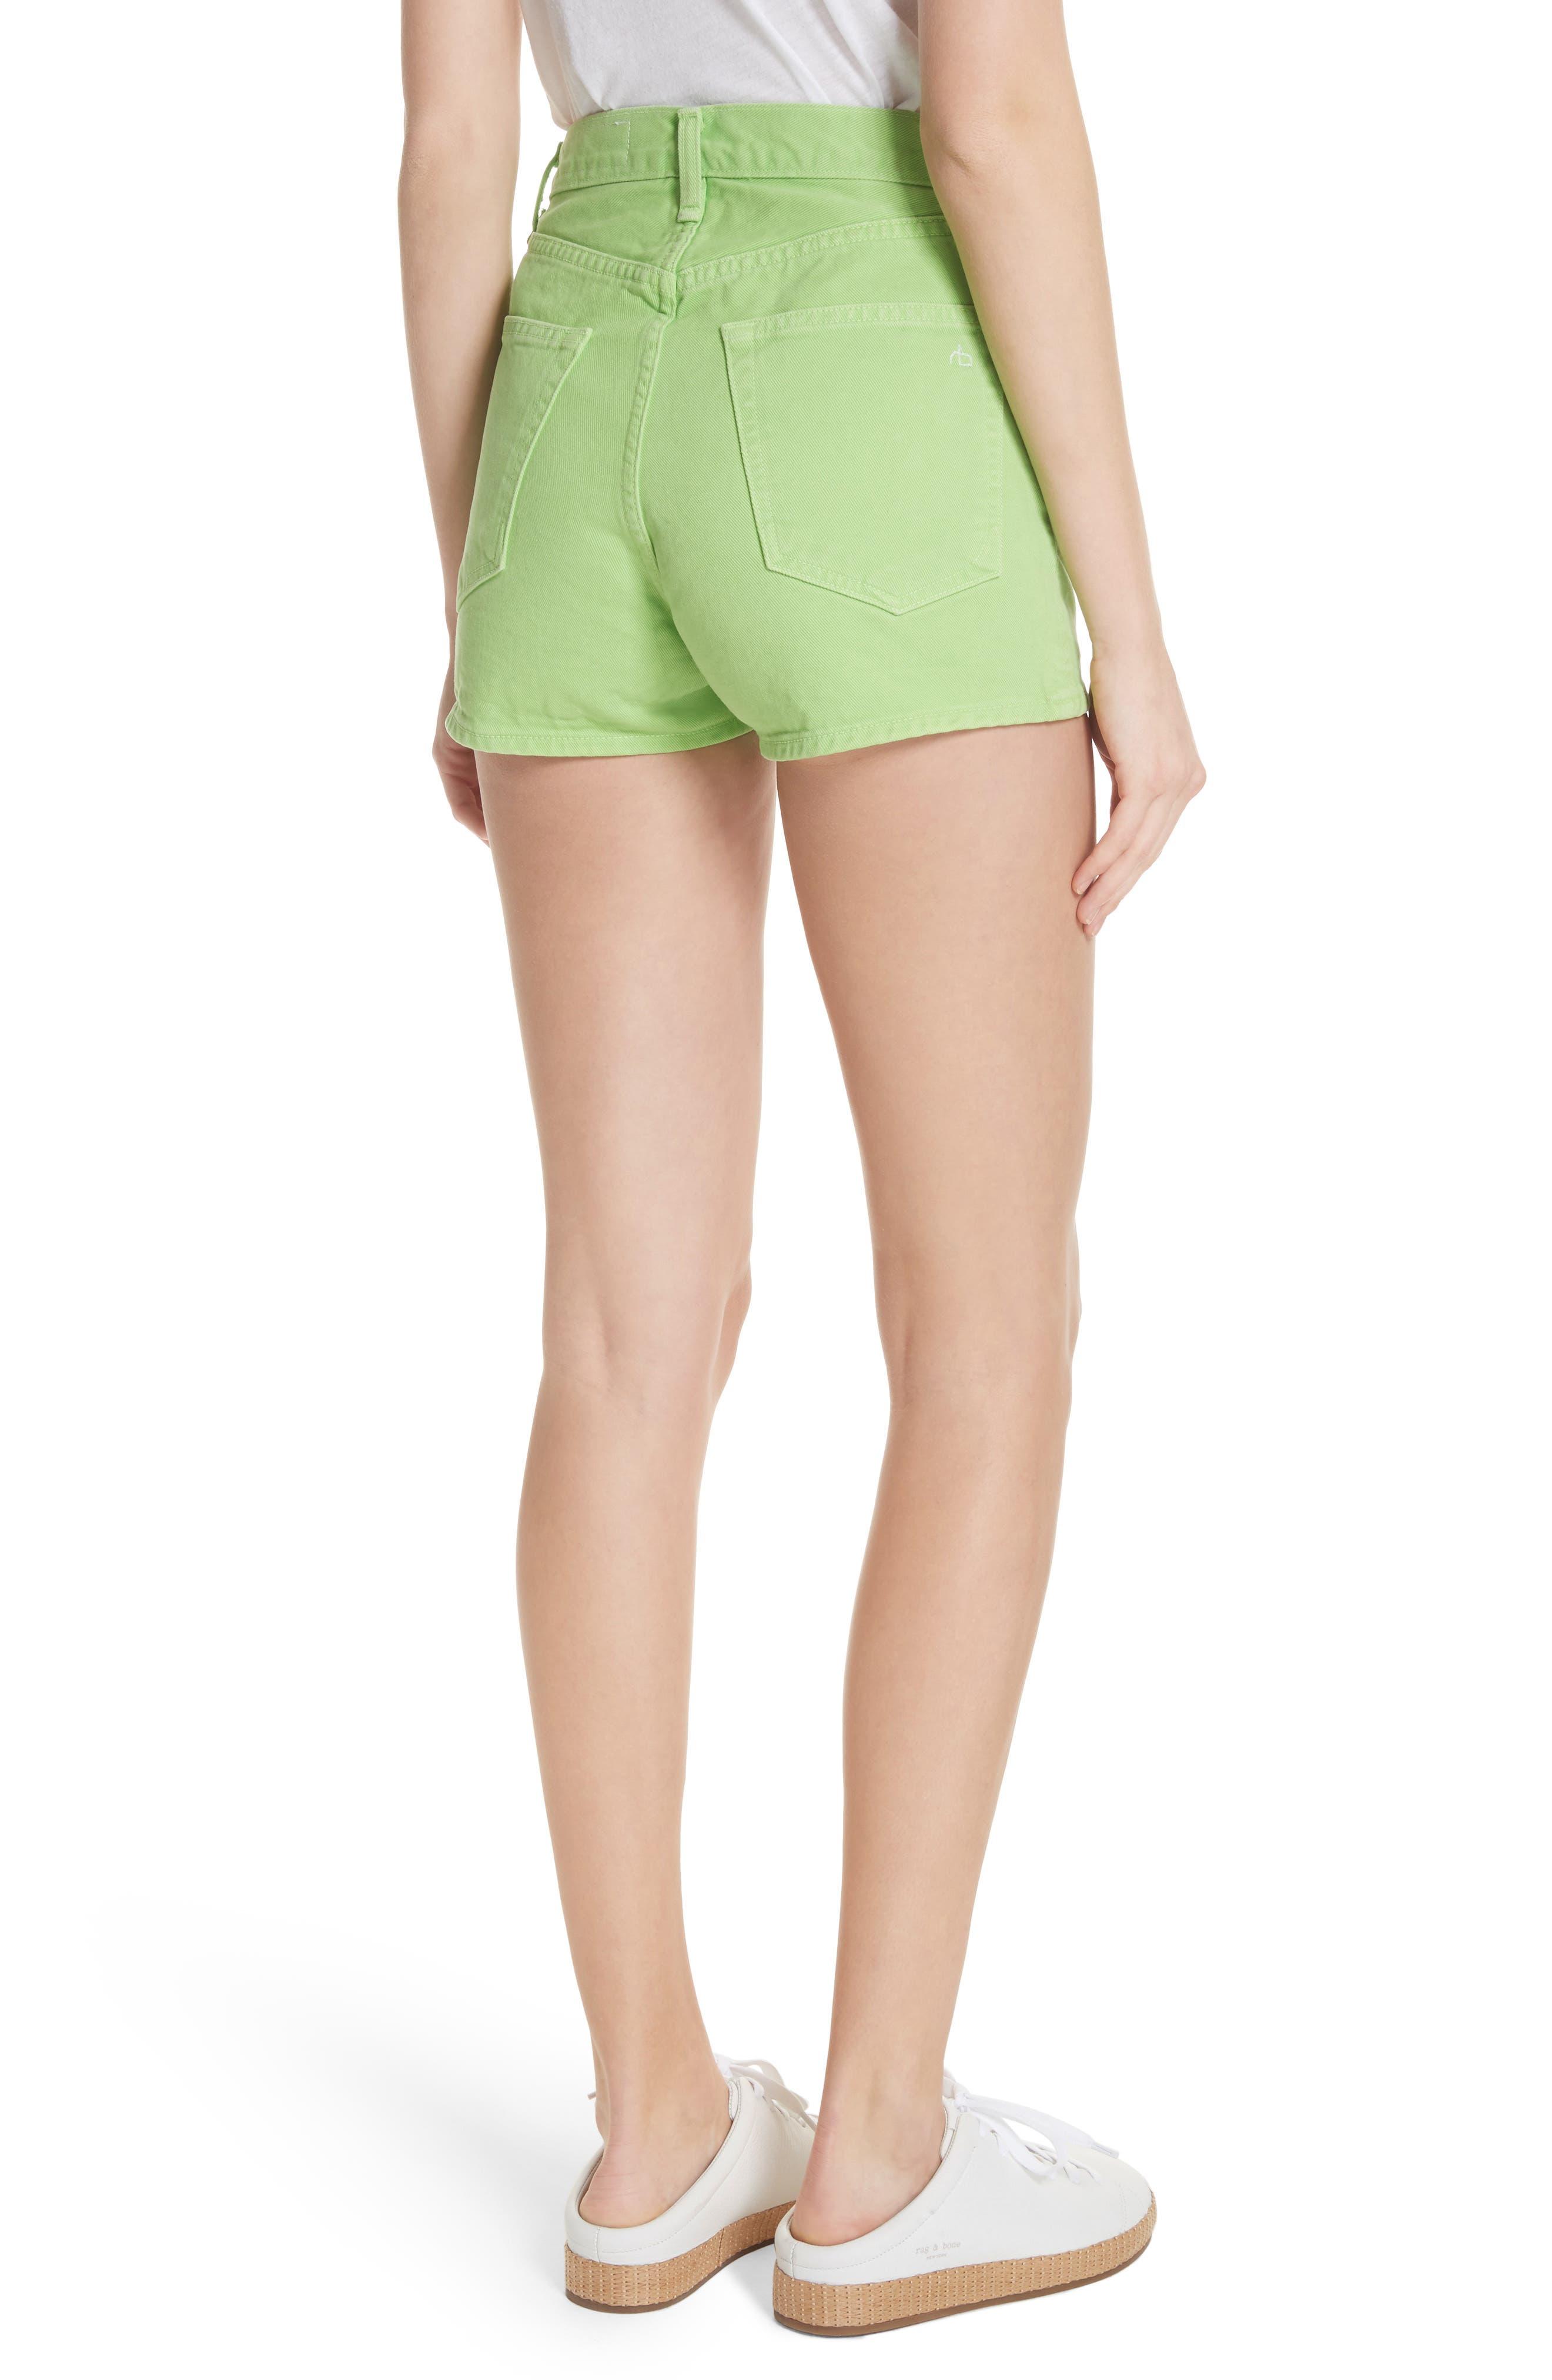 Justine High Waist Denim Shorts,                             Alternate thumbnail 2, color,                             Lime